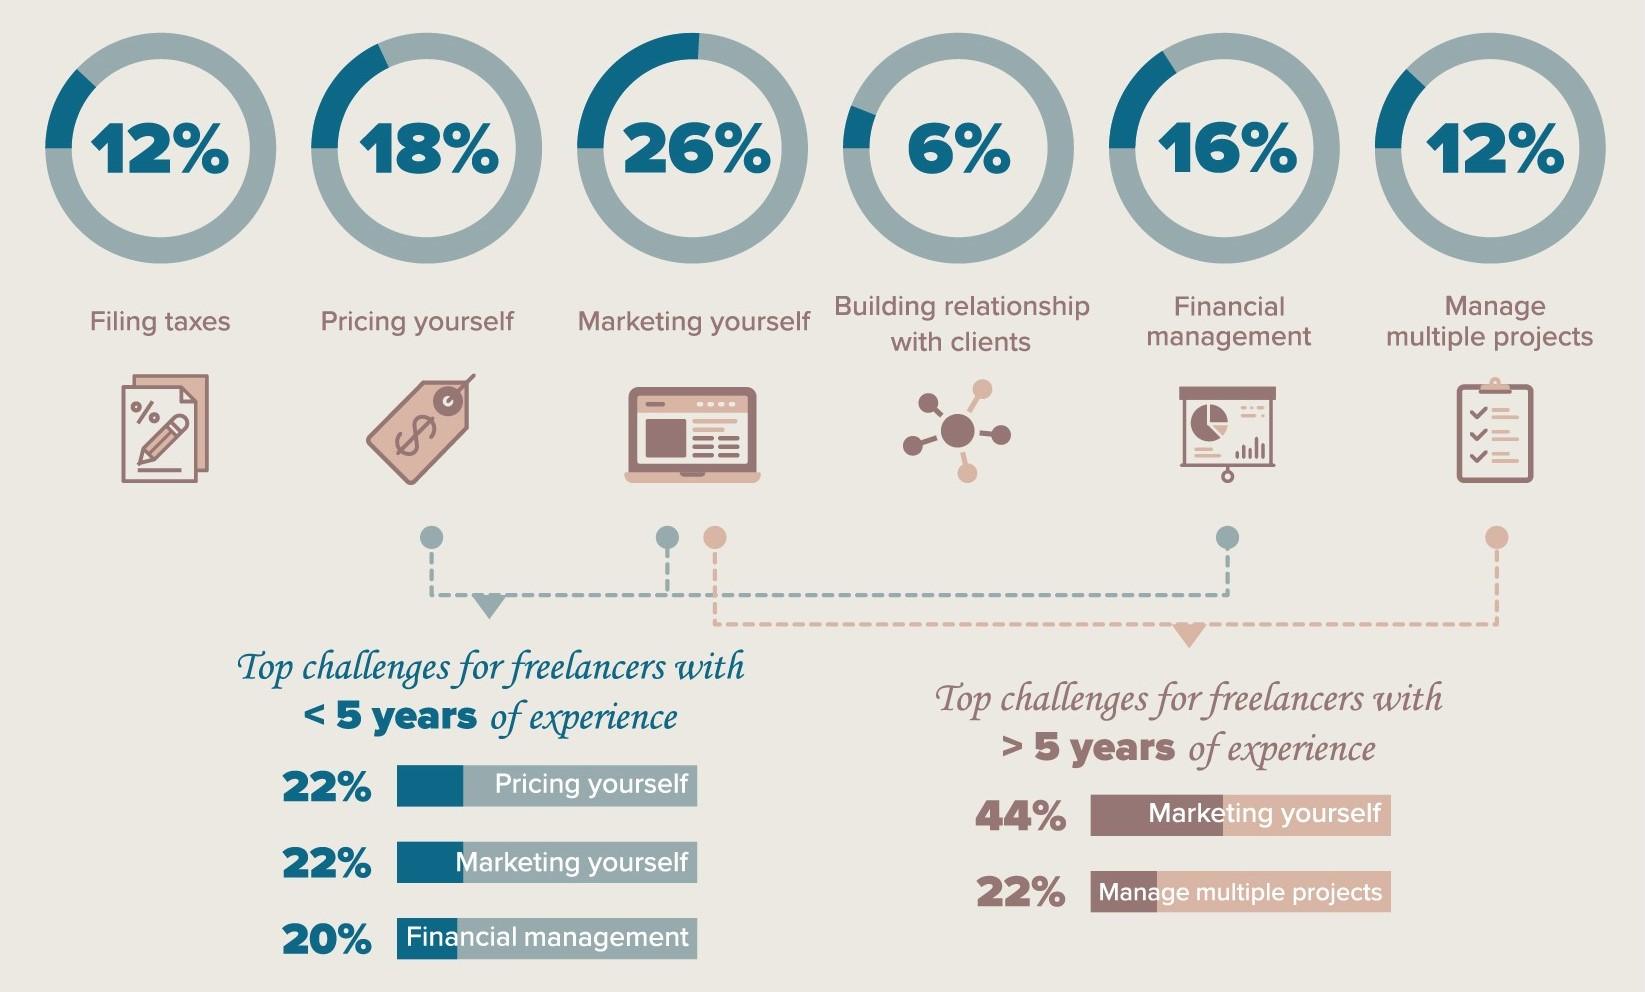 PRESENTATION DESIGN - Infographic: Millennial freelancers & BanksDesign Compendium: packaging trend reportsRetail bank transformation pitch deck